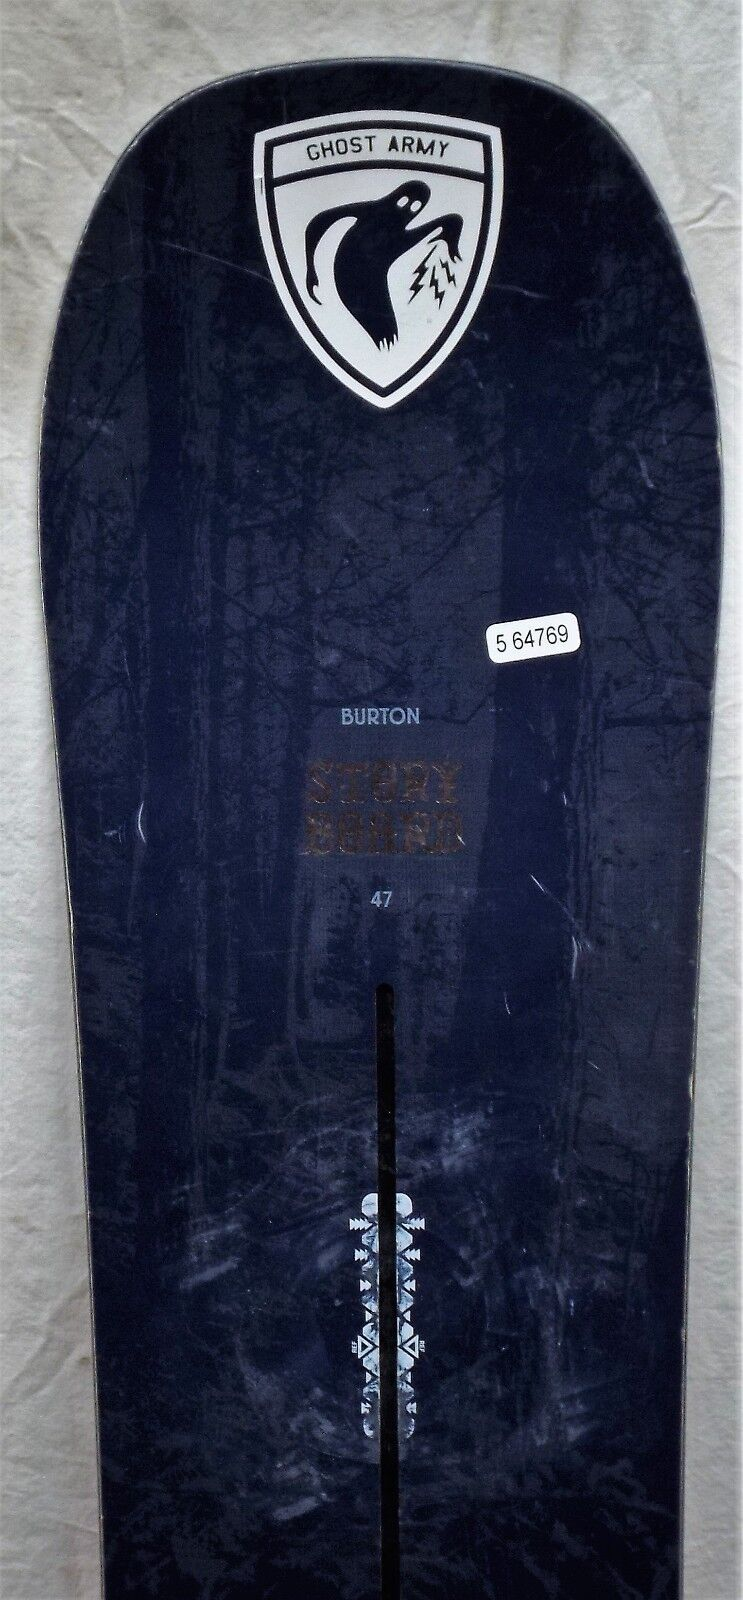 17-18 Burton Story Board Used Women's Demo Snowboard Size 147cm